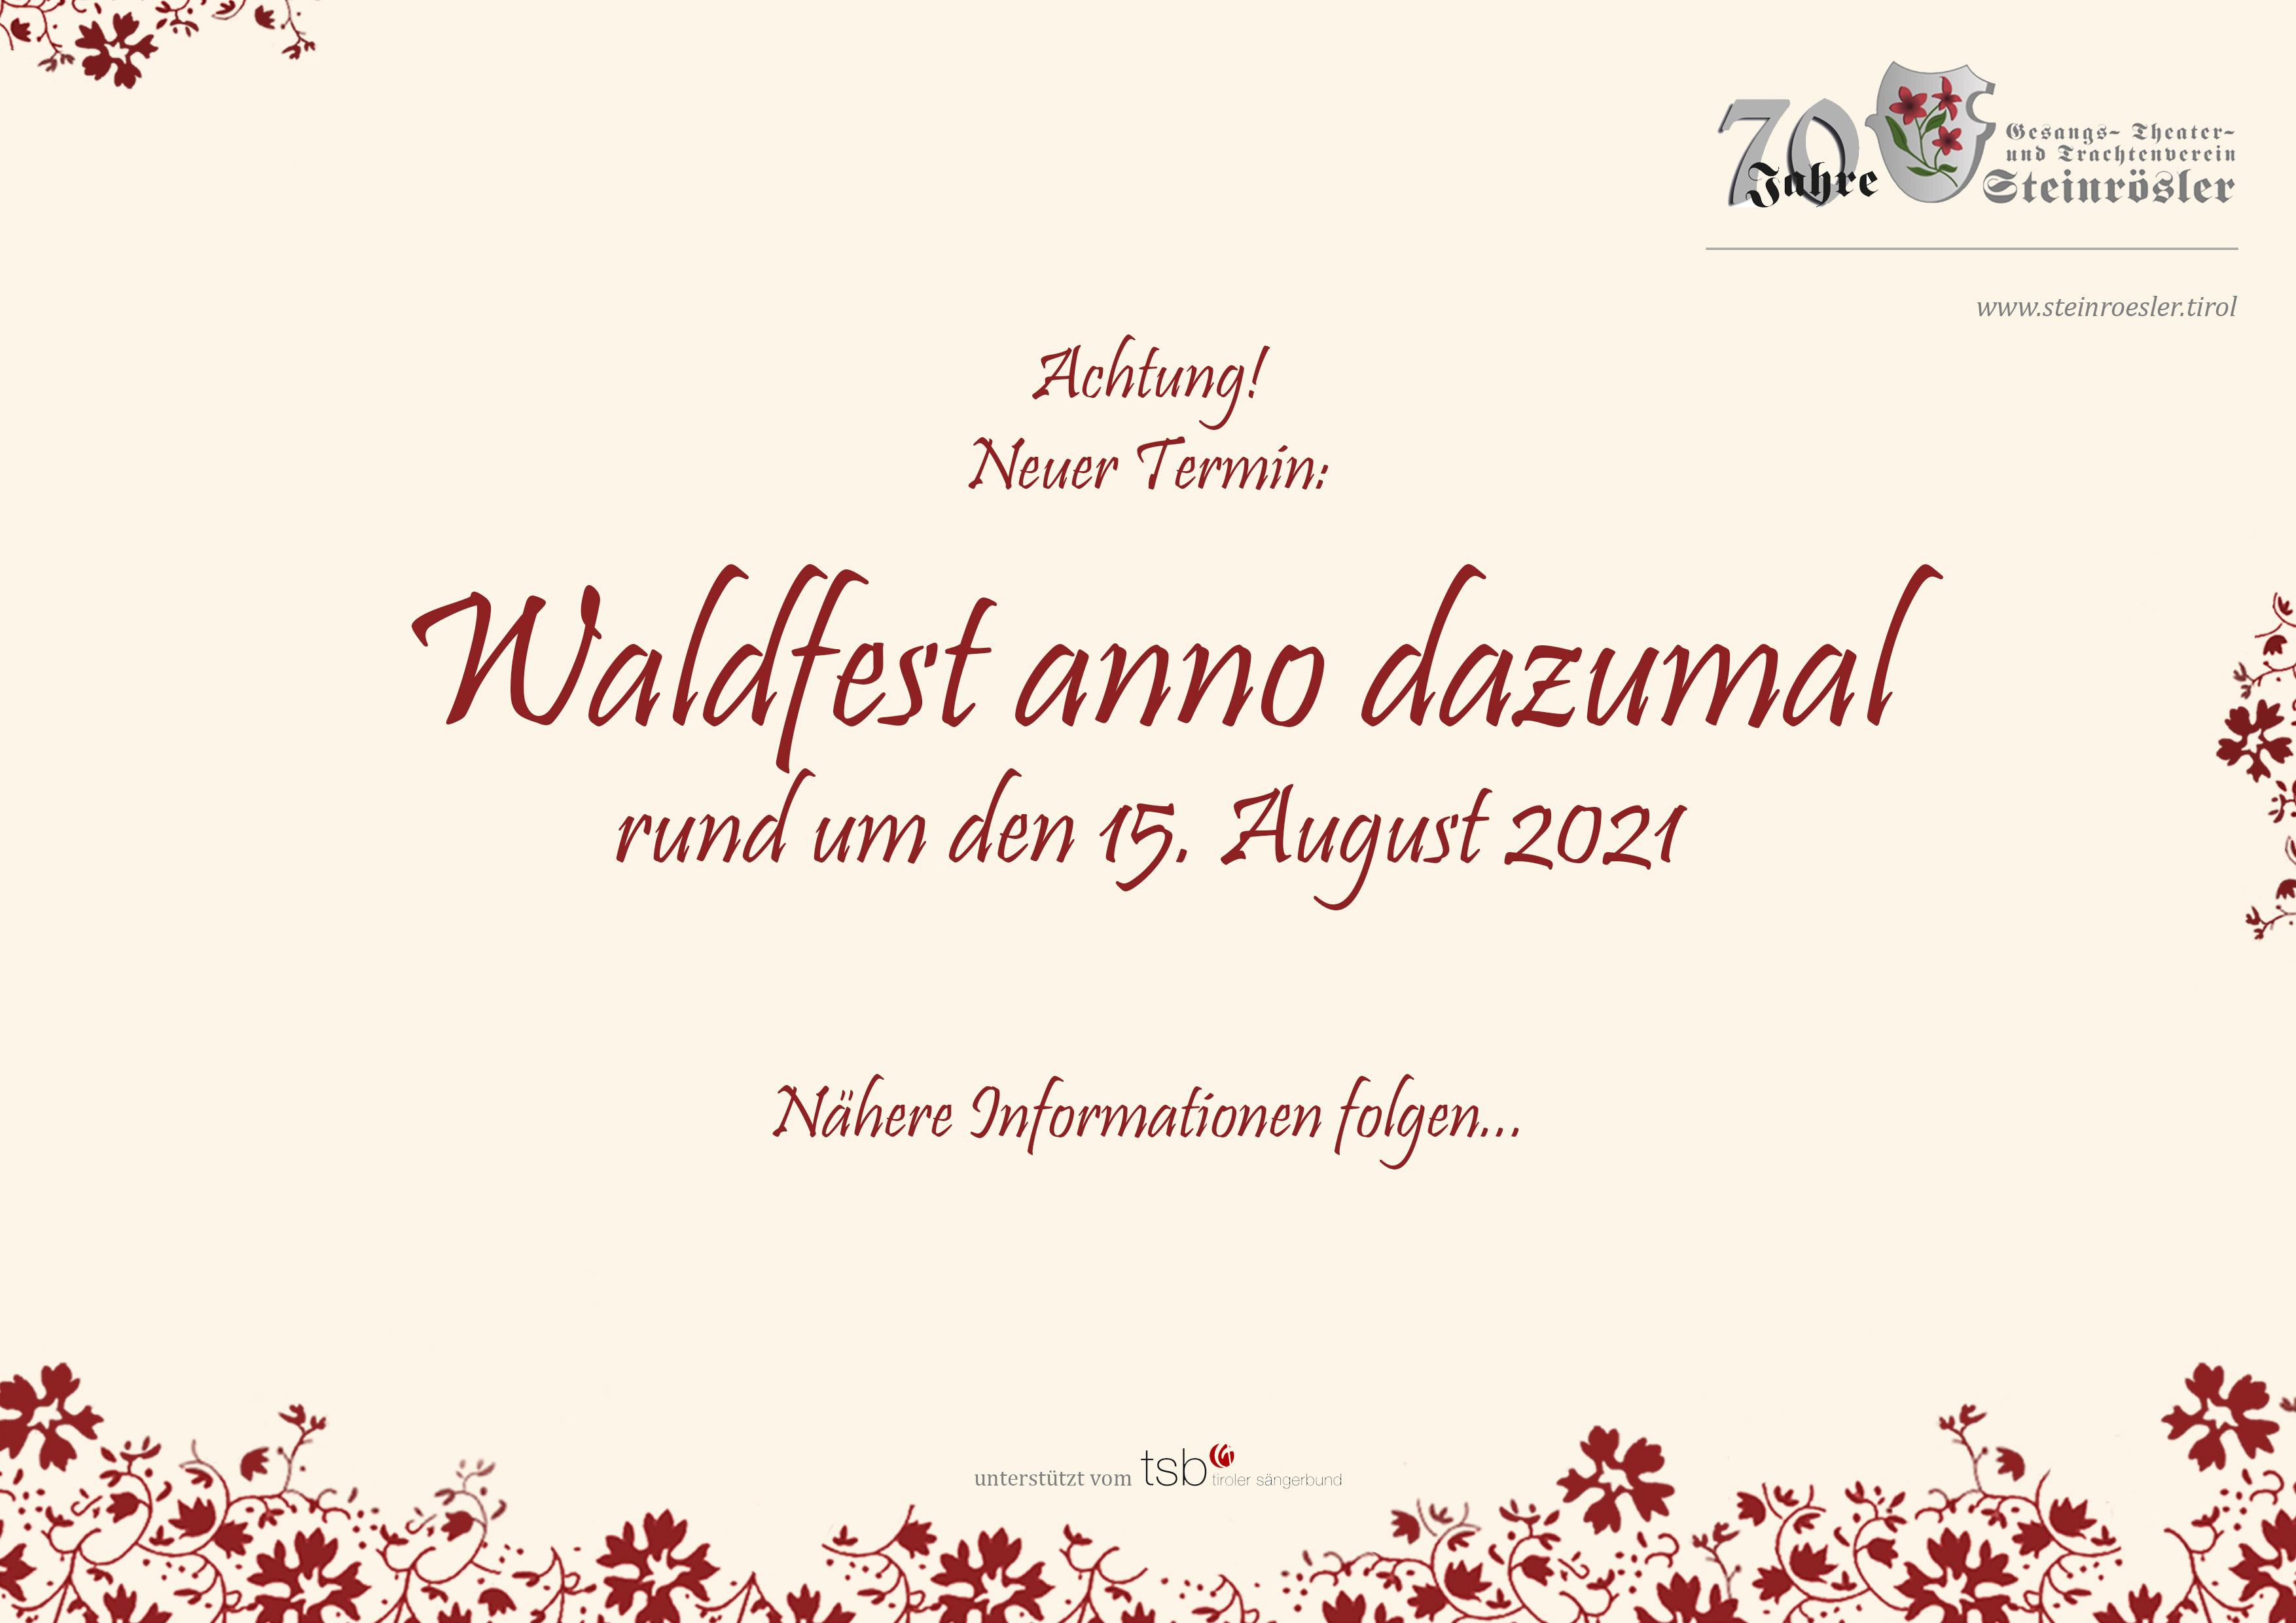 Terminaviso_Waldfest anno dazumal_2021